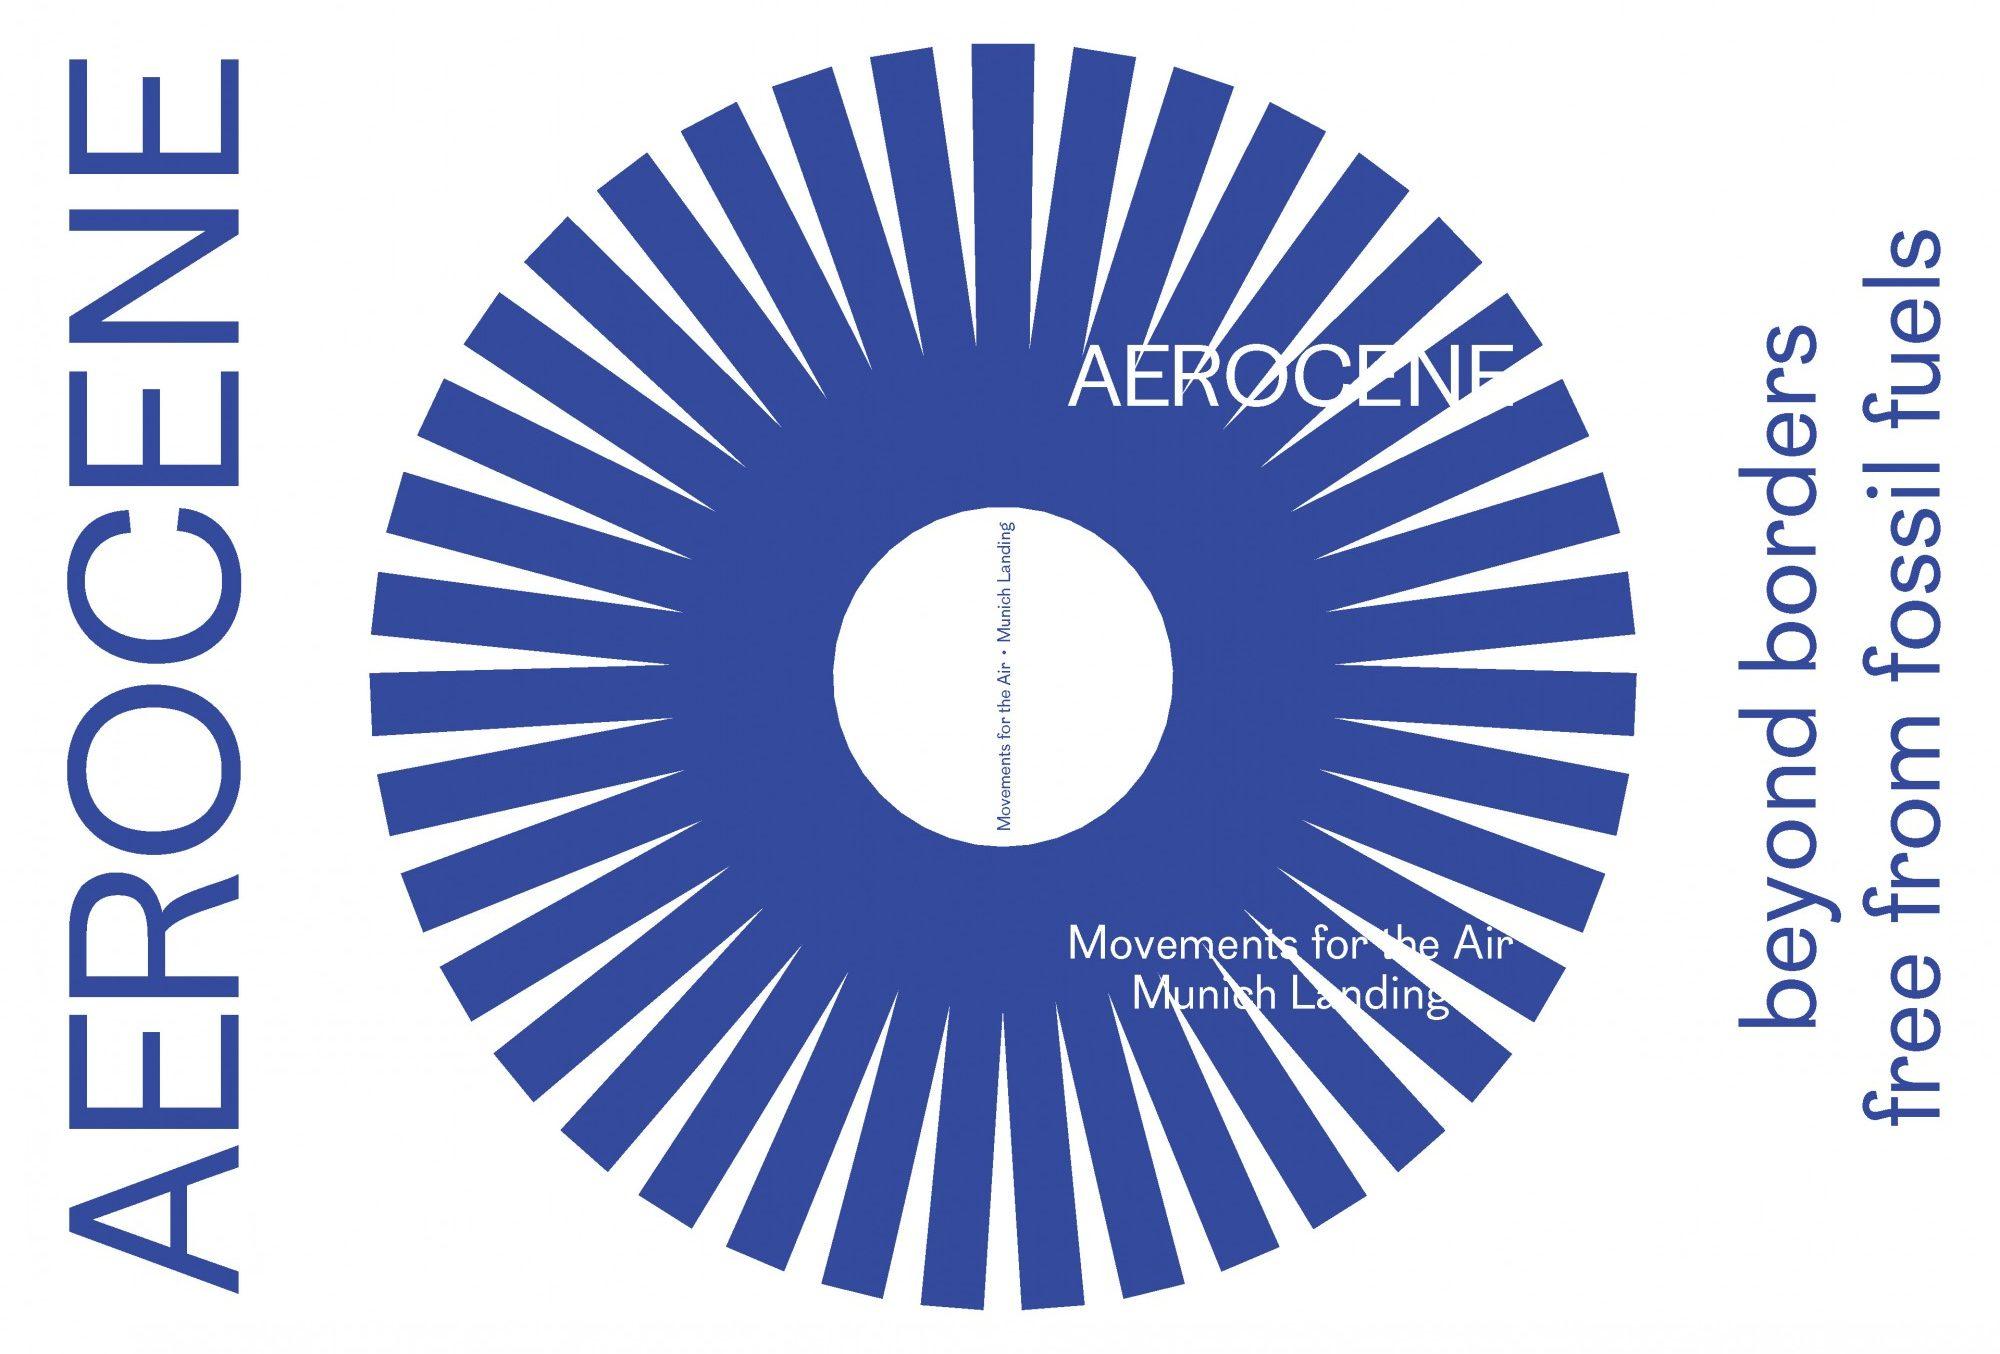 20AE_MovementsfortheAir_Aerocene_poster (1)_Page_1